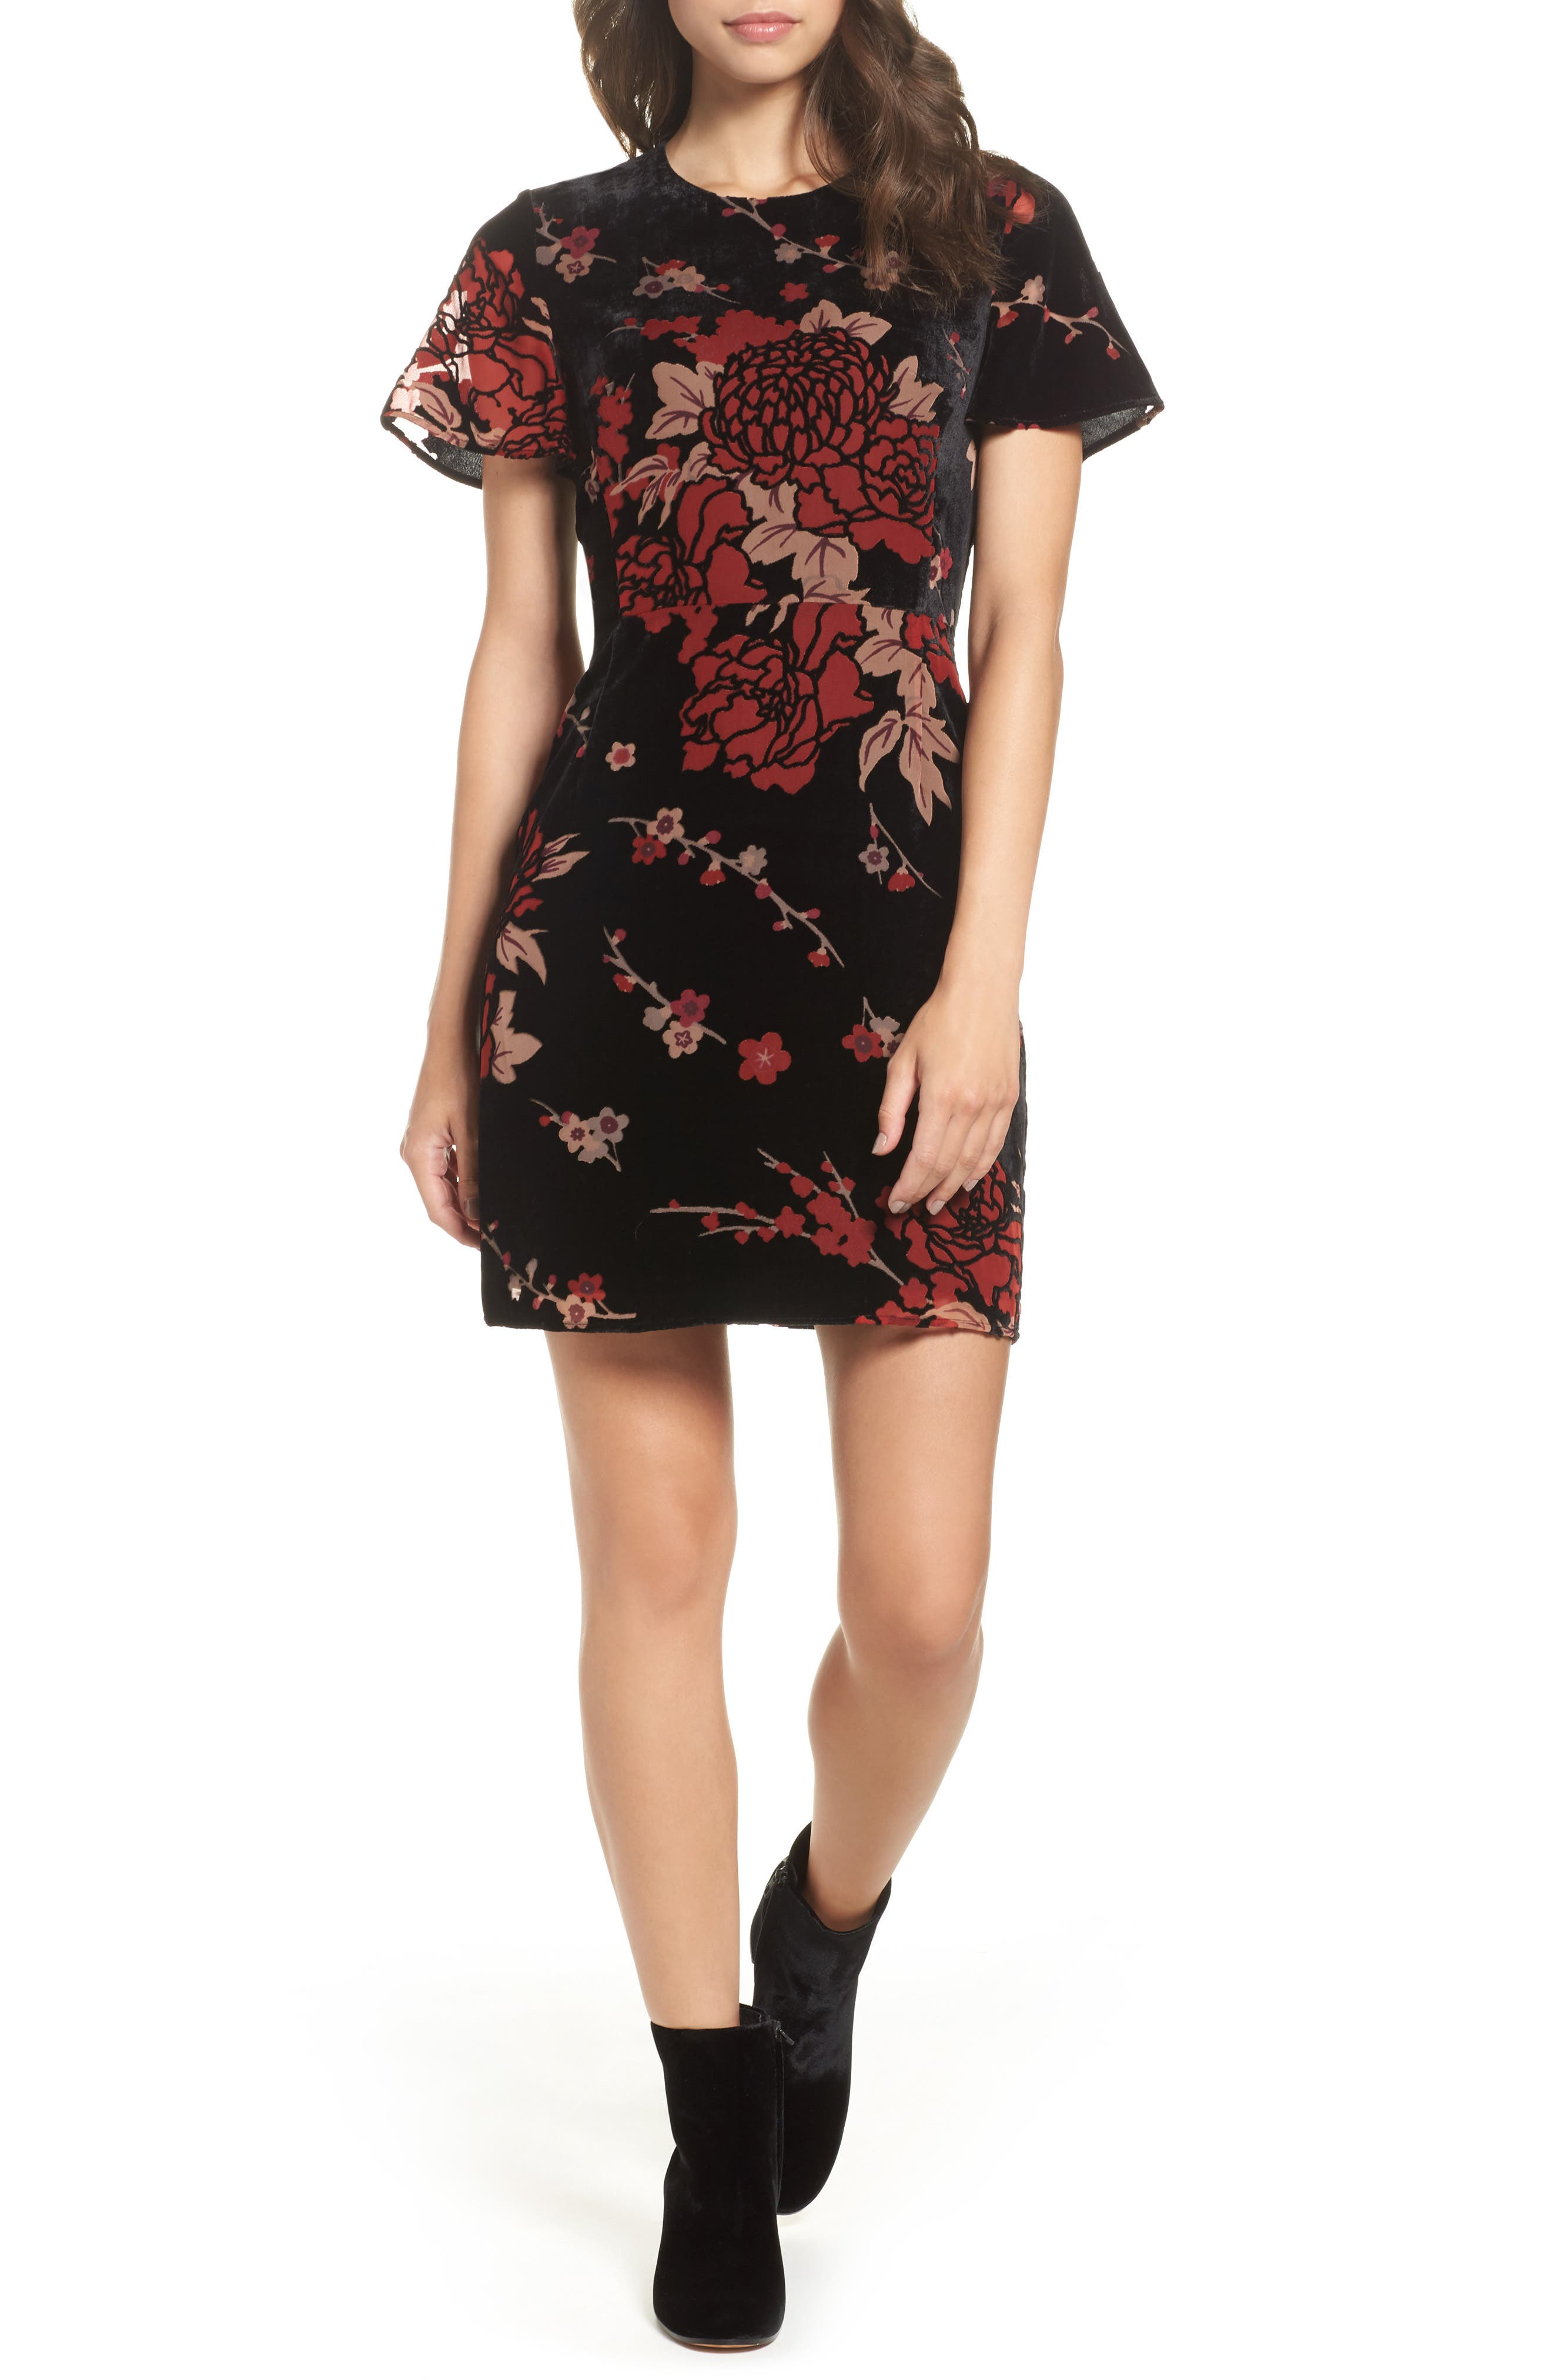 French Connection Wilma Devore Burnout Velvet A-Line Dress, Black